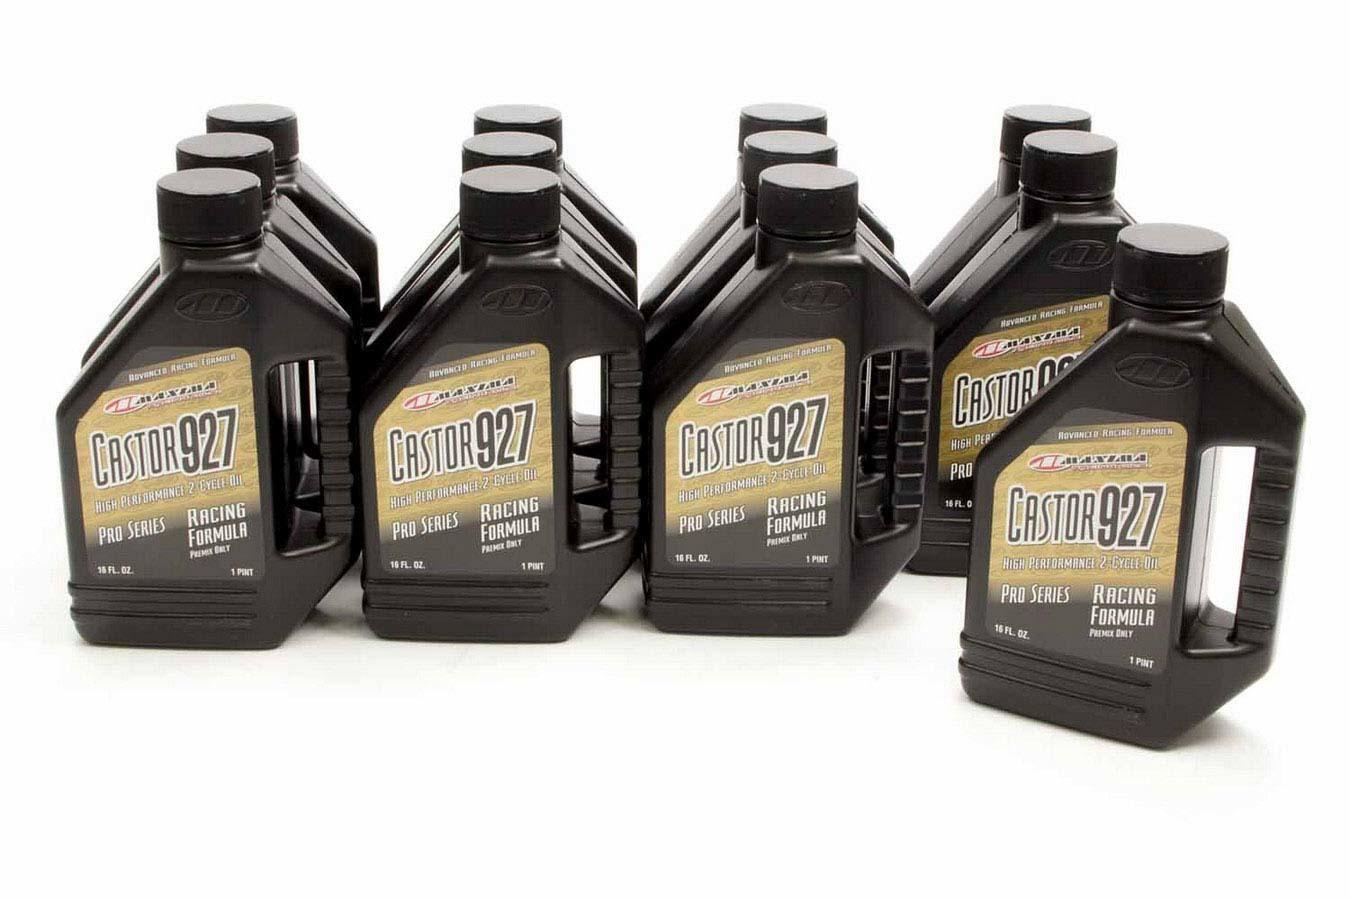 Maxima Racing Oils 23916 2 Stroke Oil, Castor 927, Conventional, 16 oz Bottle, Set of 12